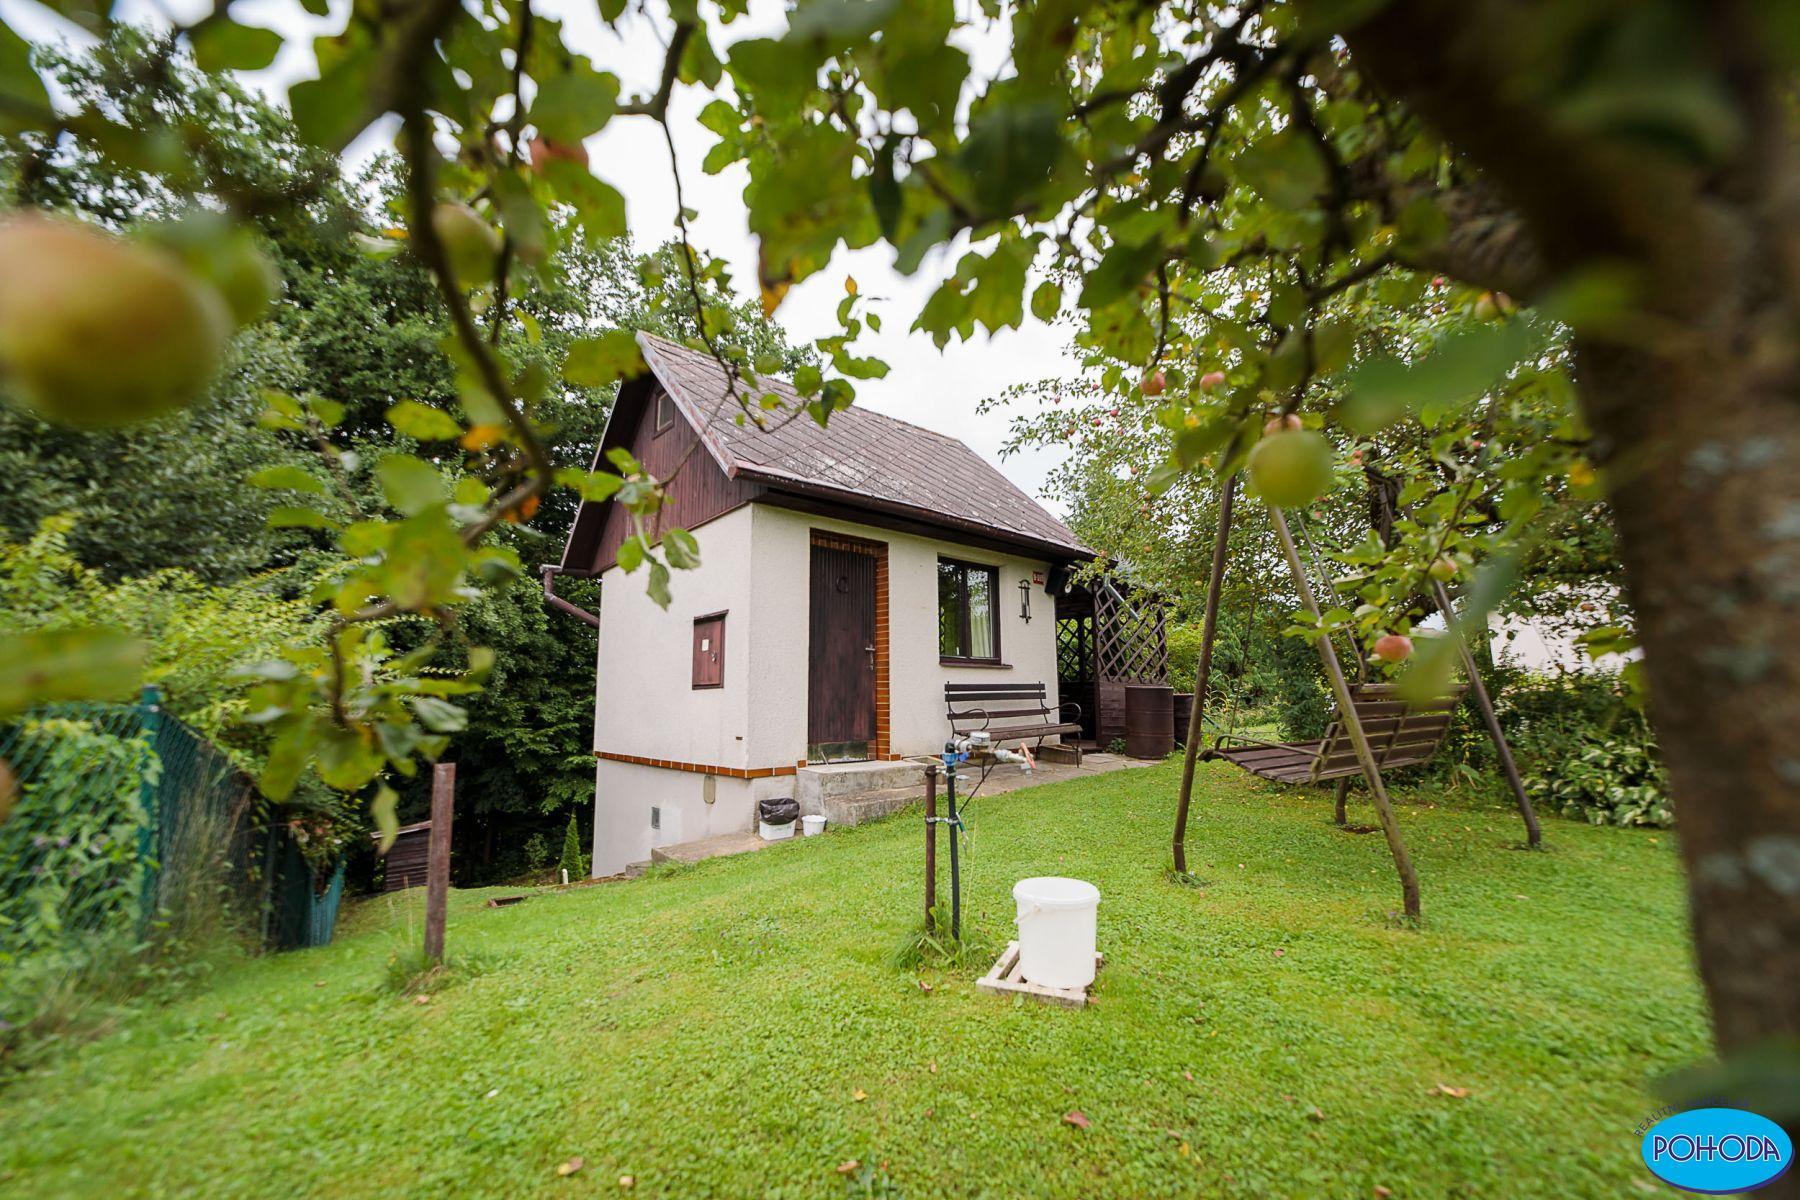 Chata Ústí nad Orlicí